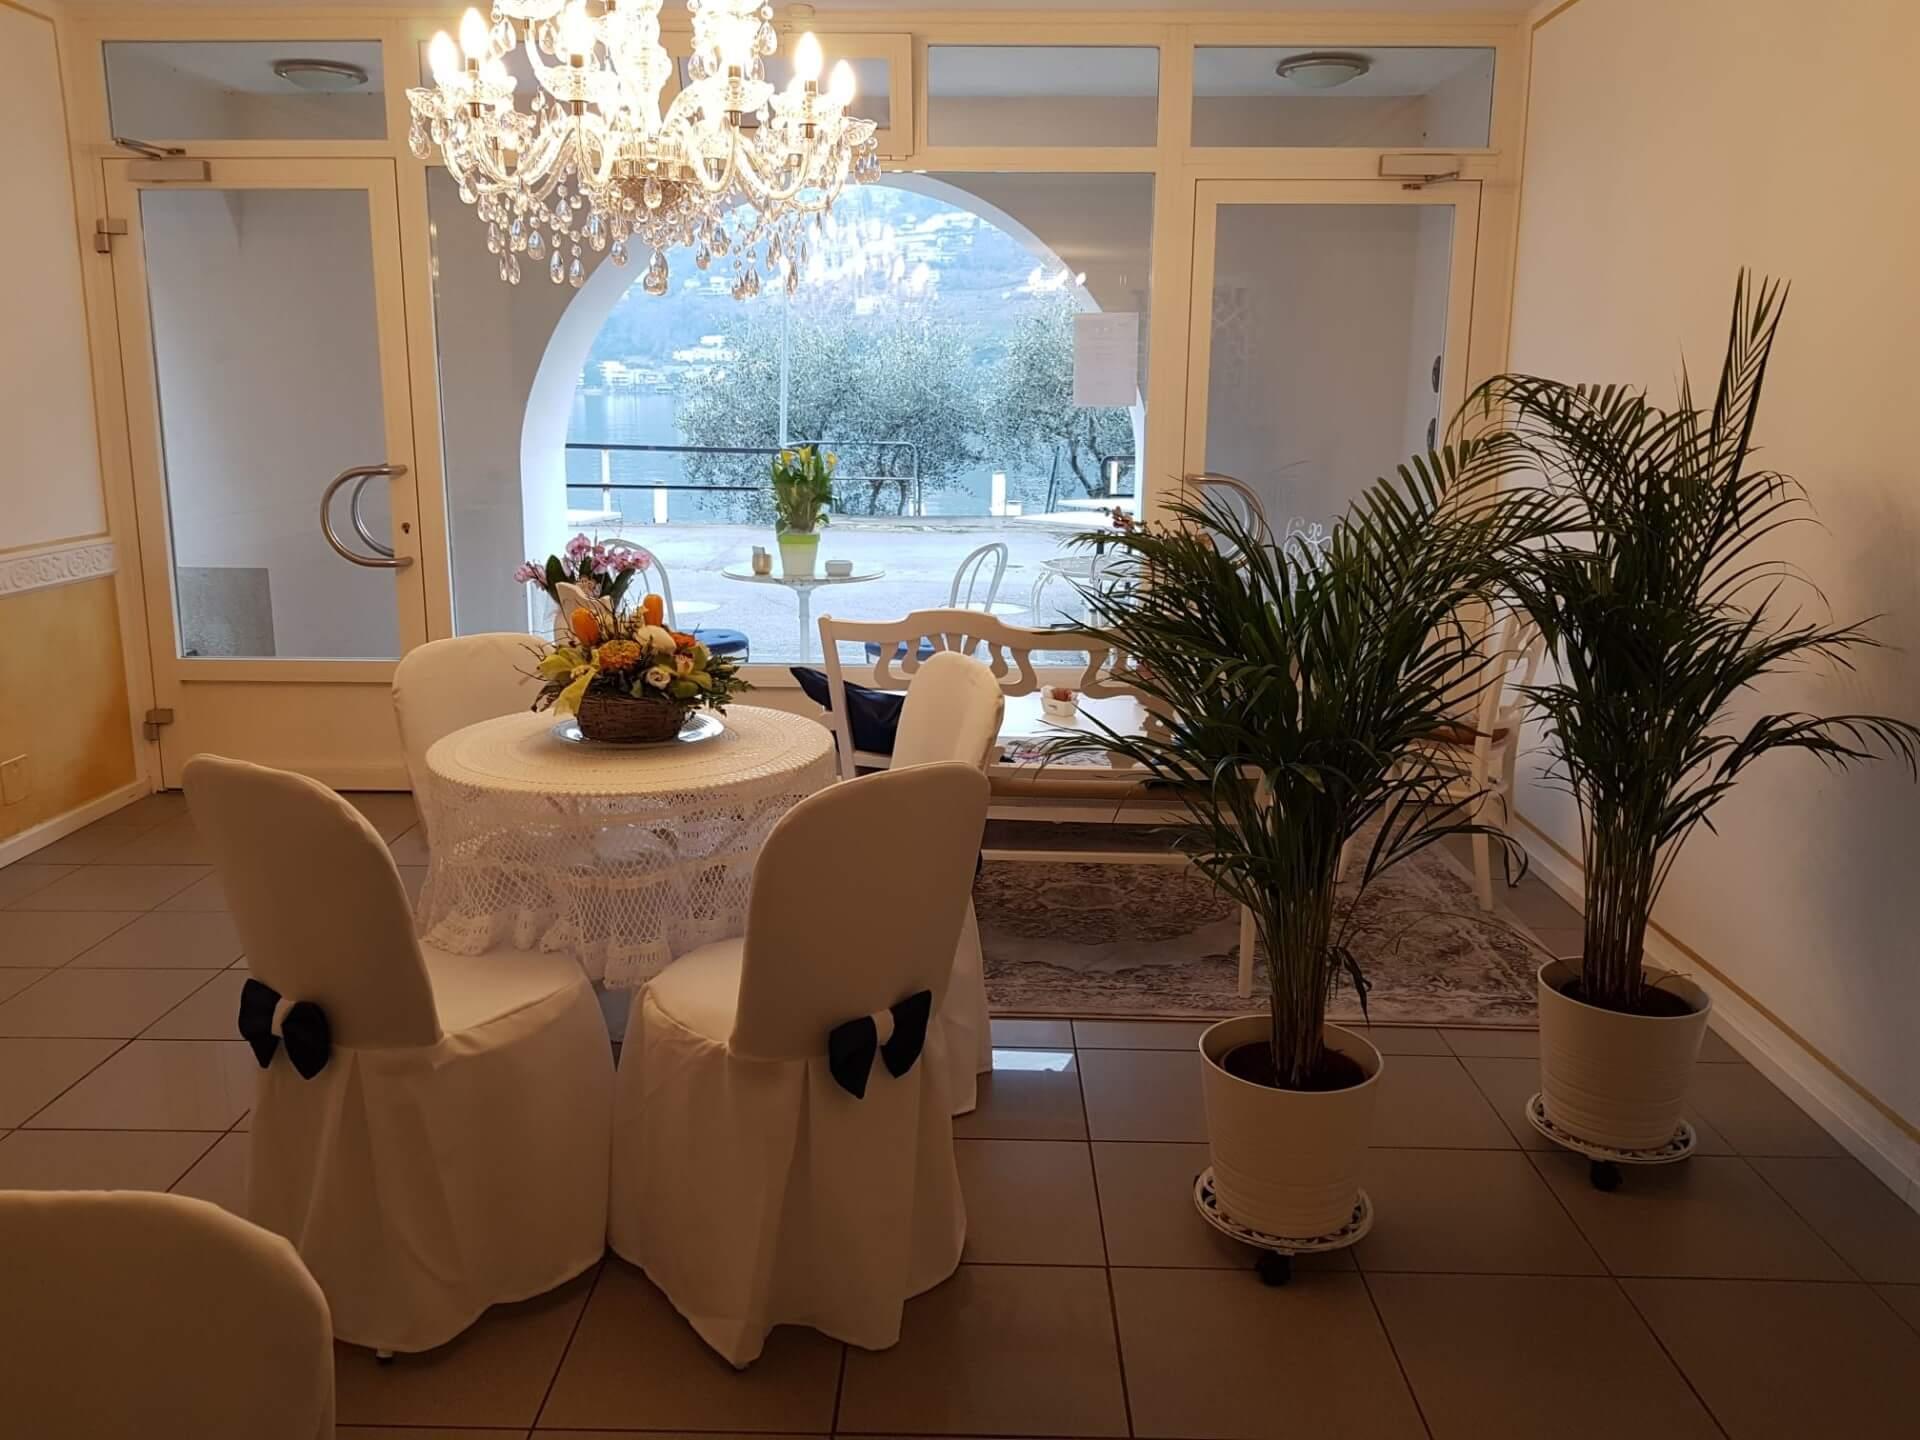 Dolceresio Lugano Lake B&B, Brusino Arsizio - Home - Reception